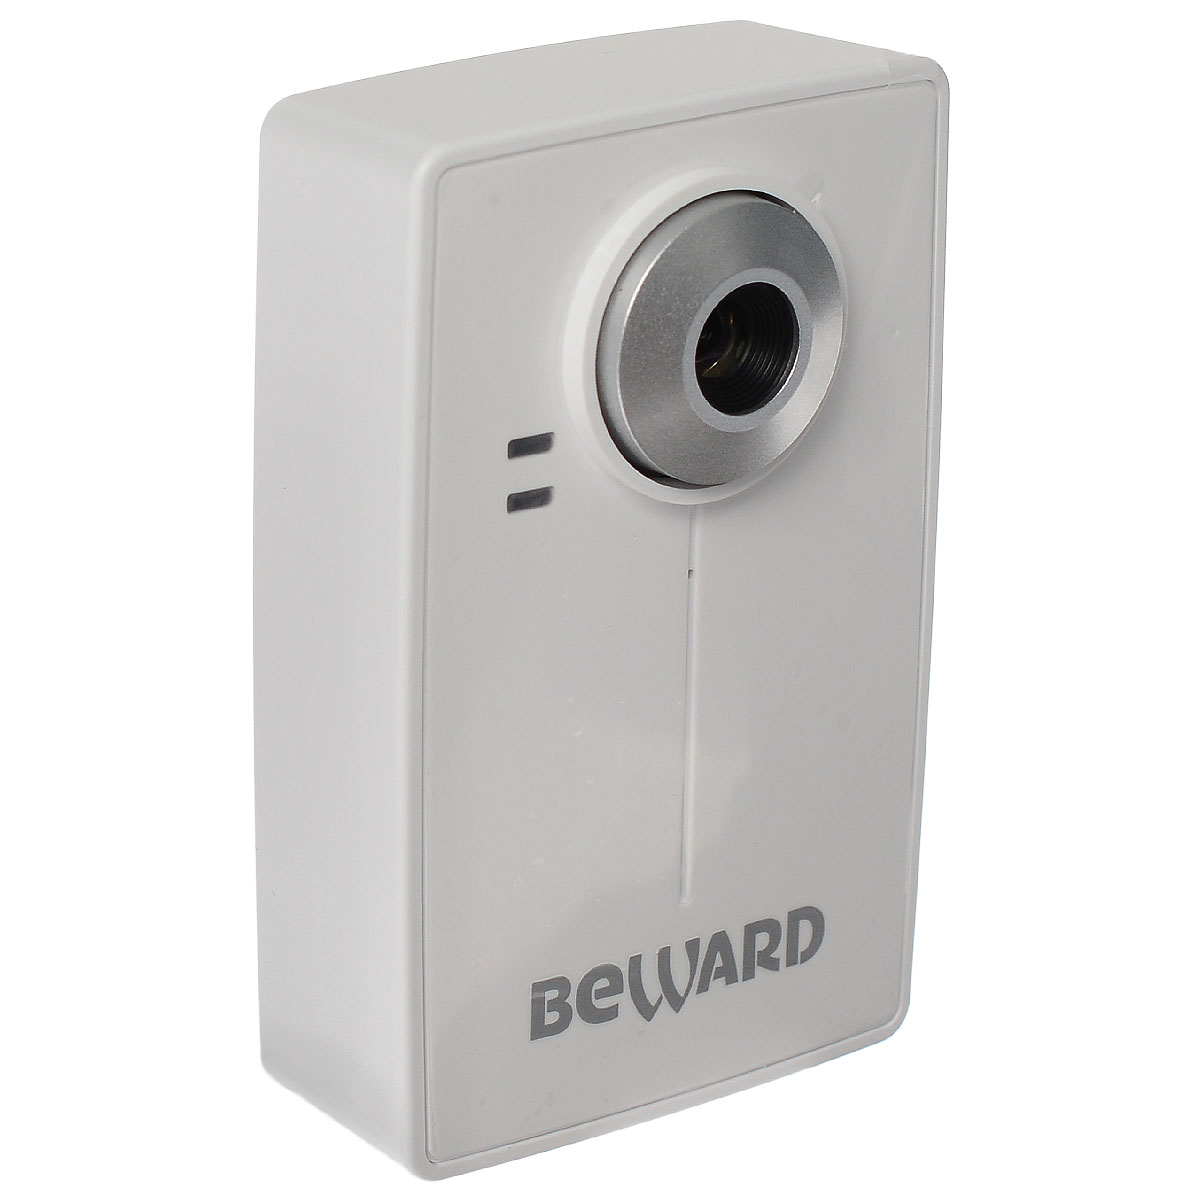 Beward N13103, White IP-камера